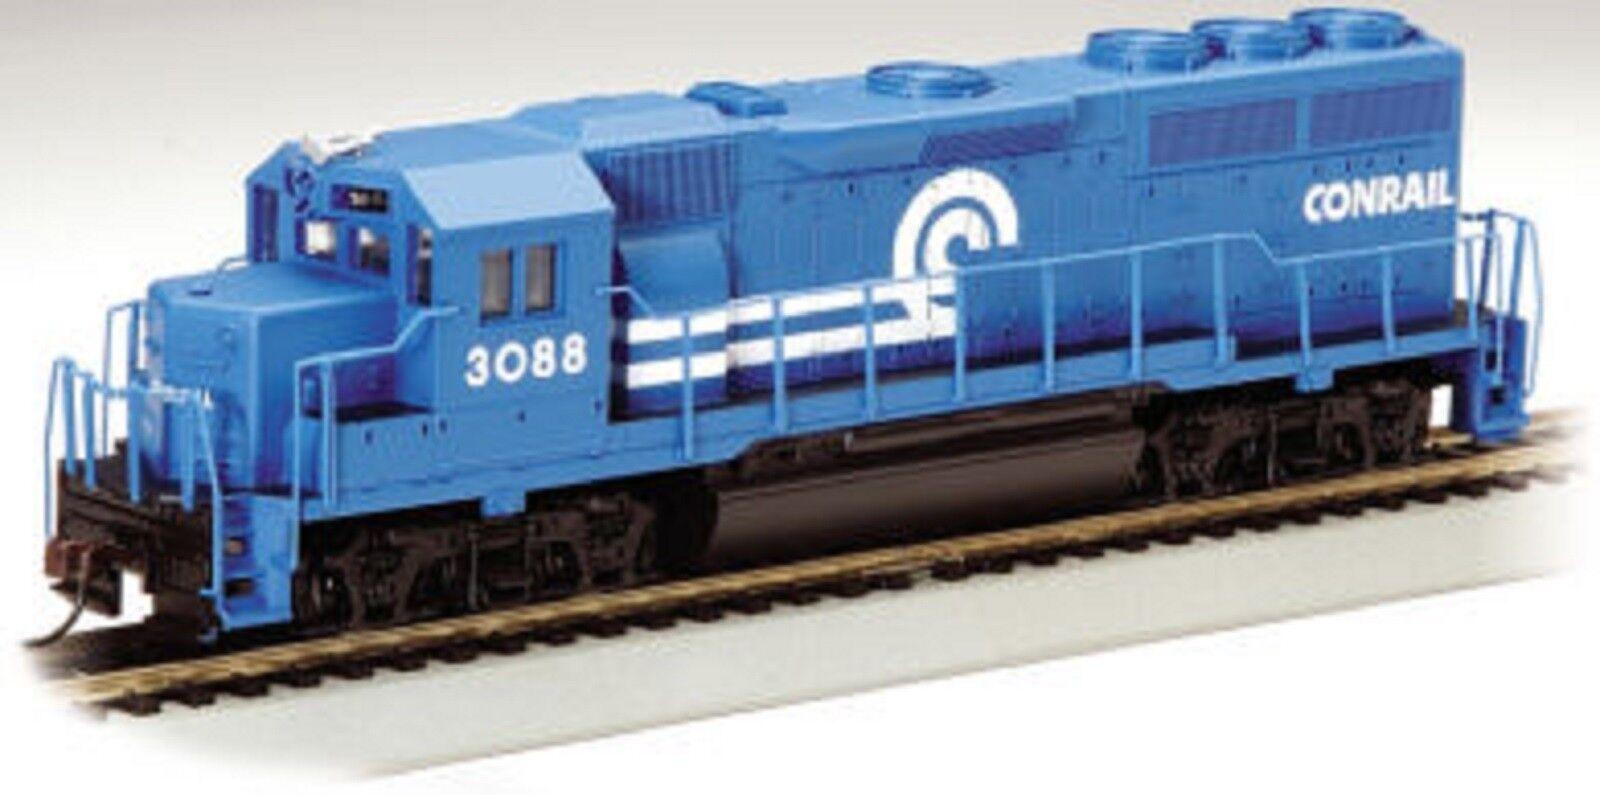 60306 Locomotive Diesel GP40 Conrail Bachmann DCC Train HO 1 87